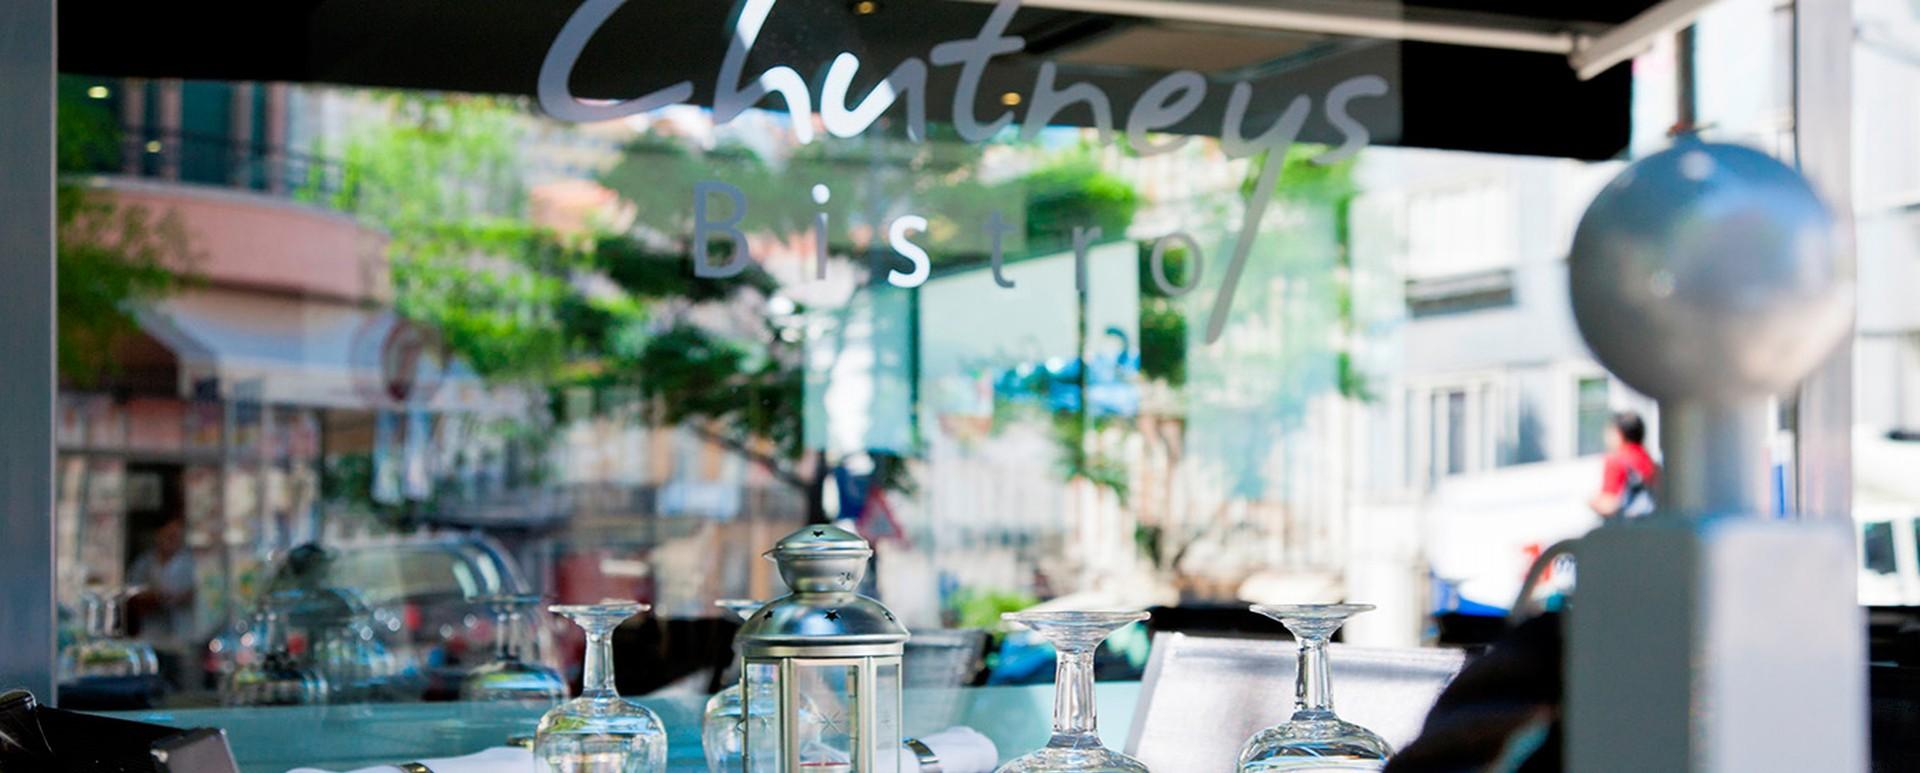 Restaurante e Bar - banner